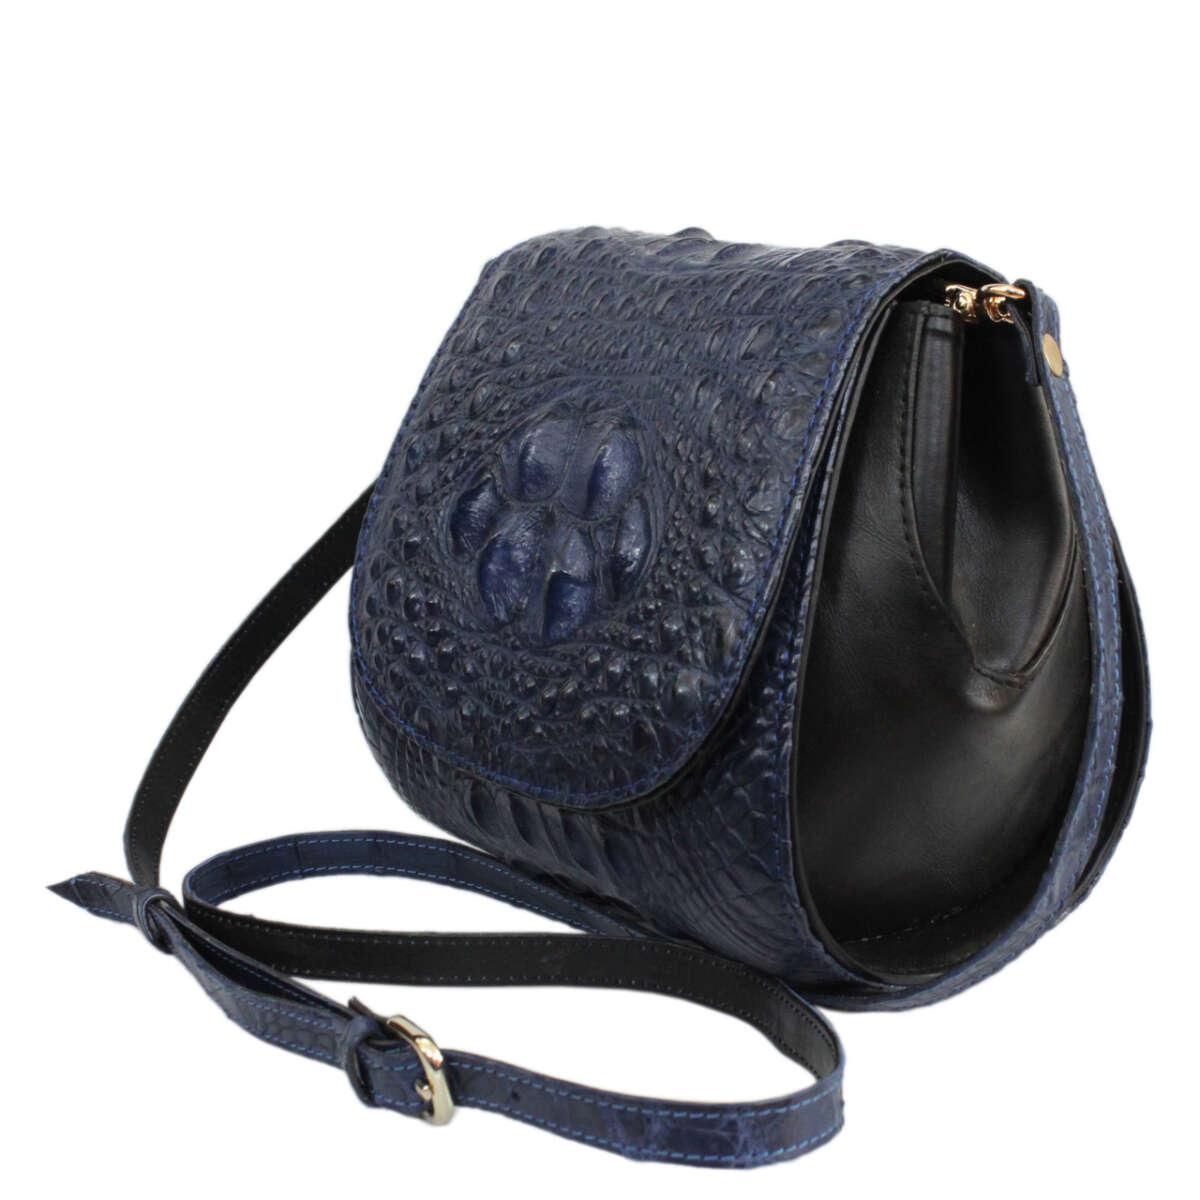 Túi đeo chéo nữ da cá sấu S122a